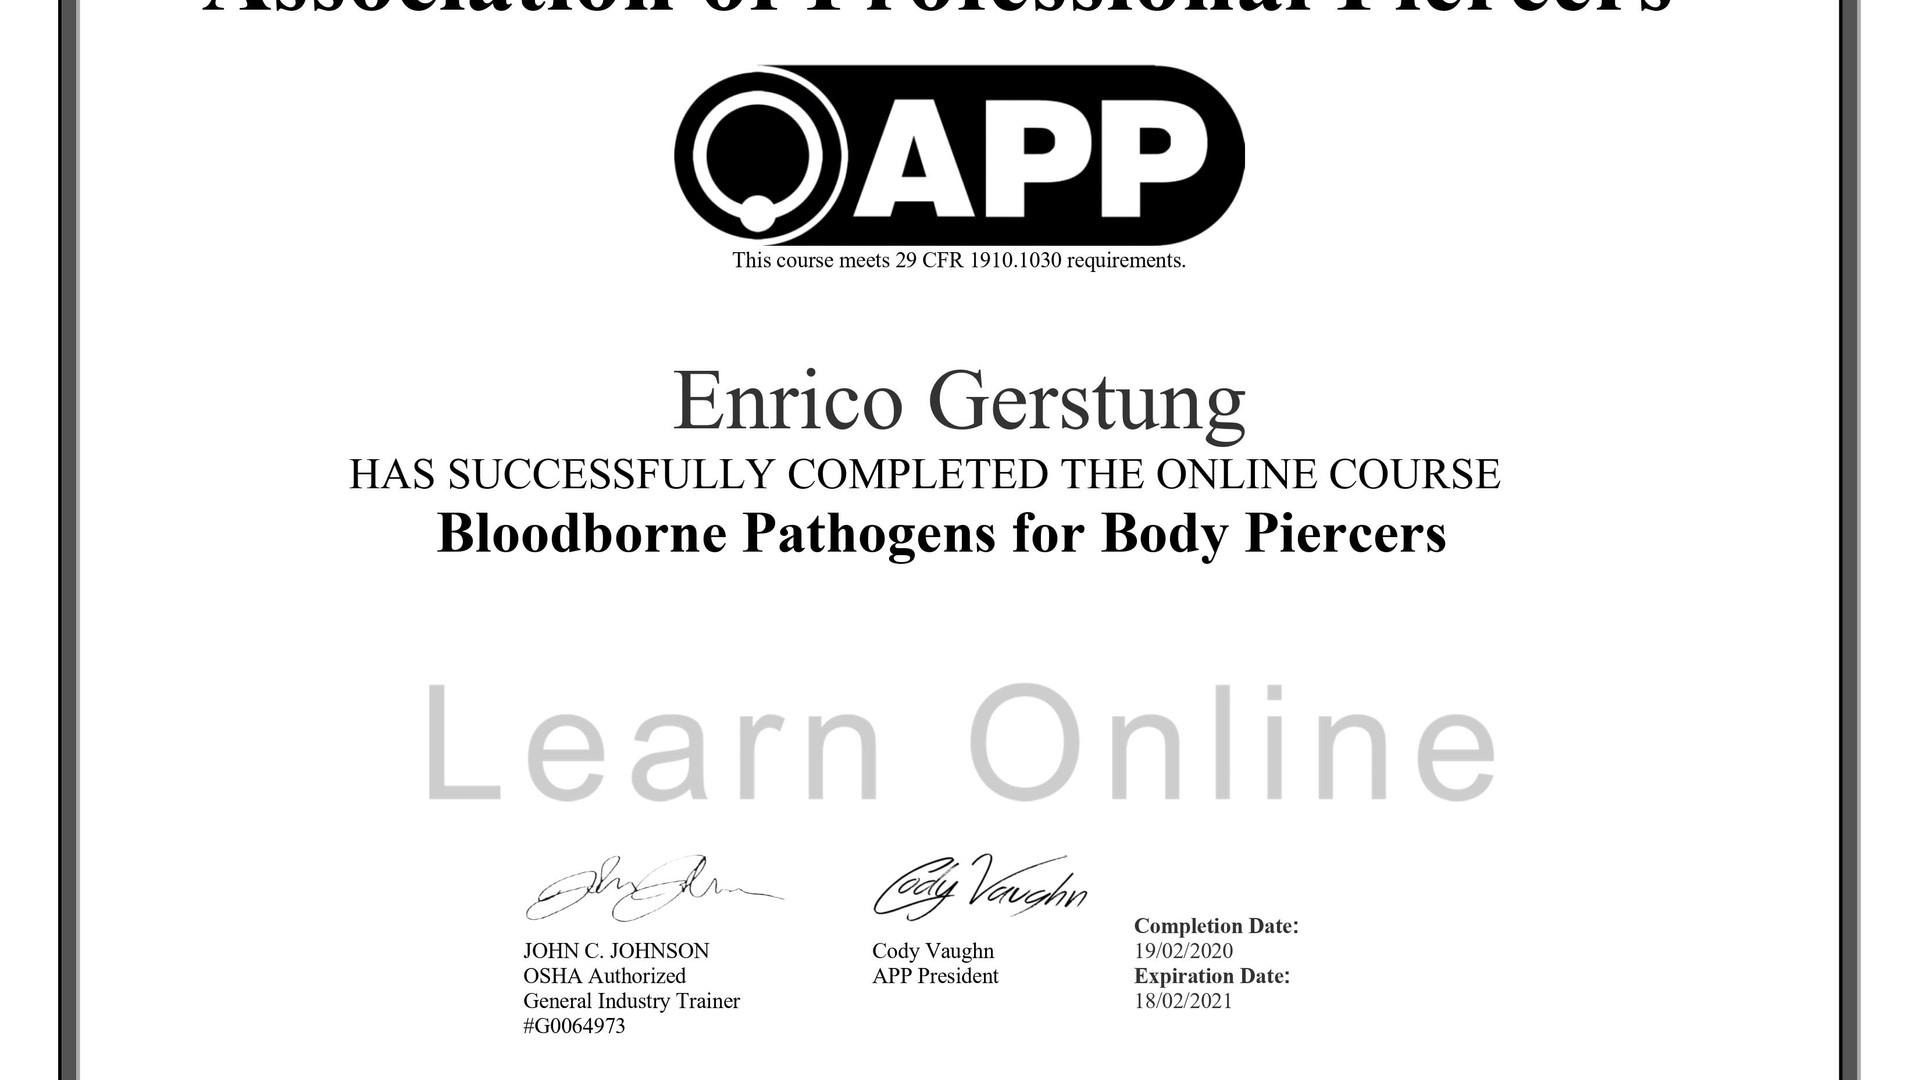 boodborne pathogens Enrico - 2020